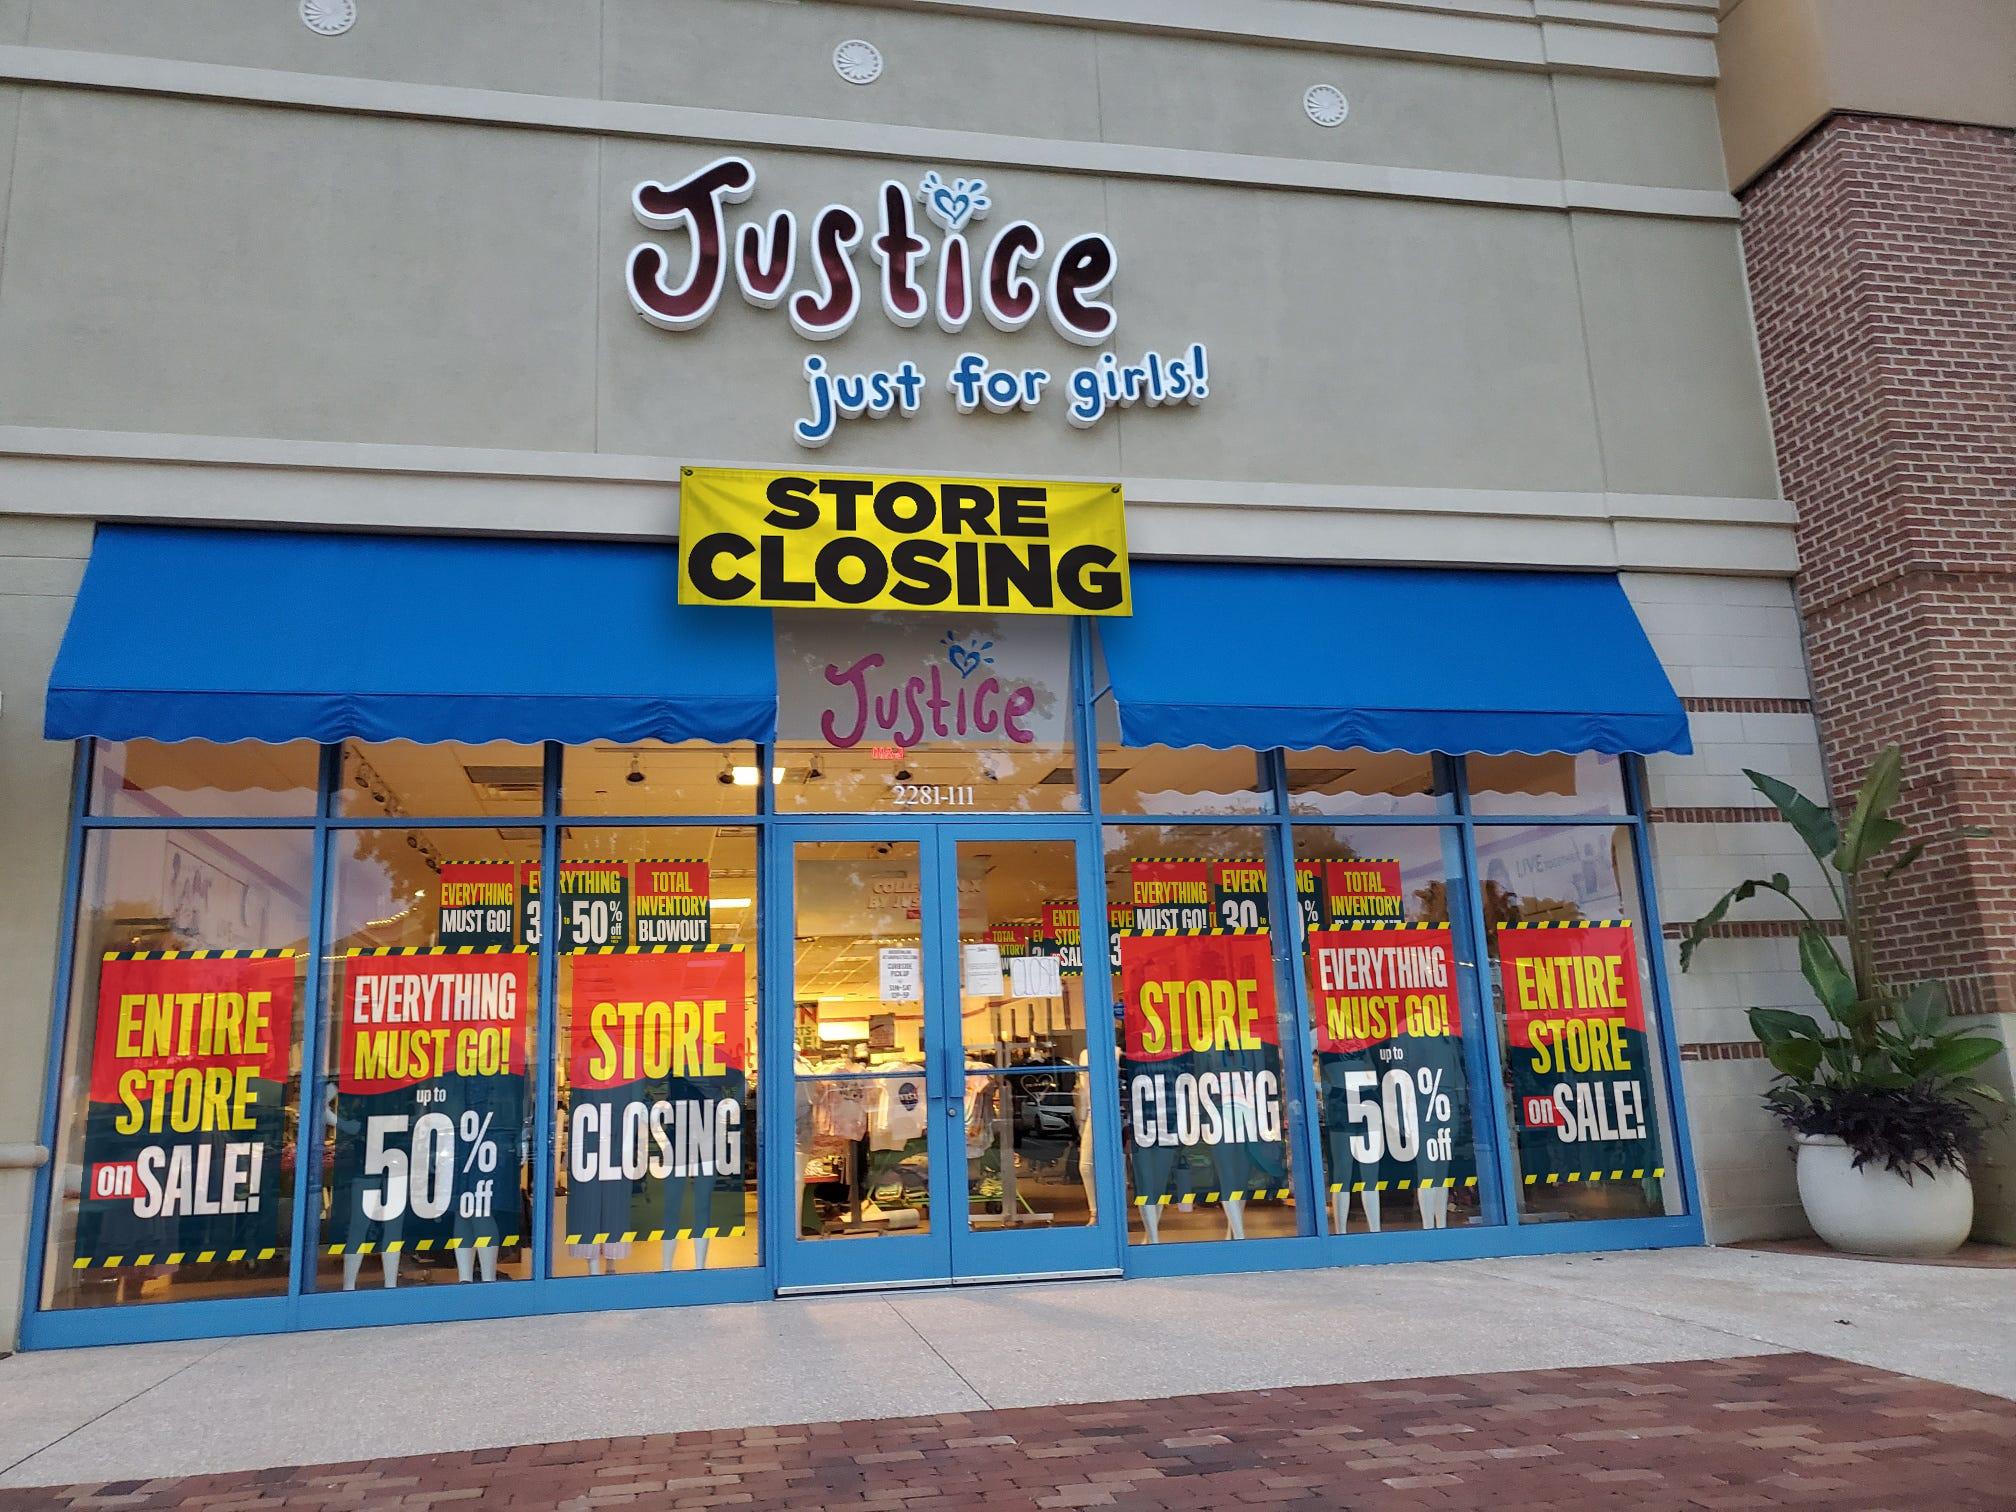 justice store closures 2020 see full list of tween stores closing justice store closures 2020 see full